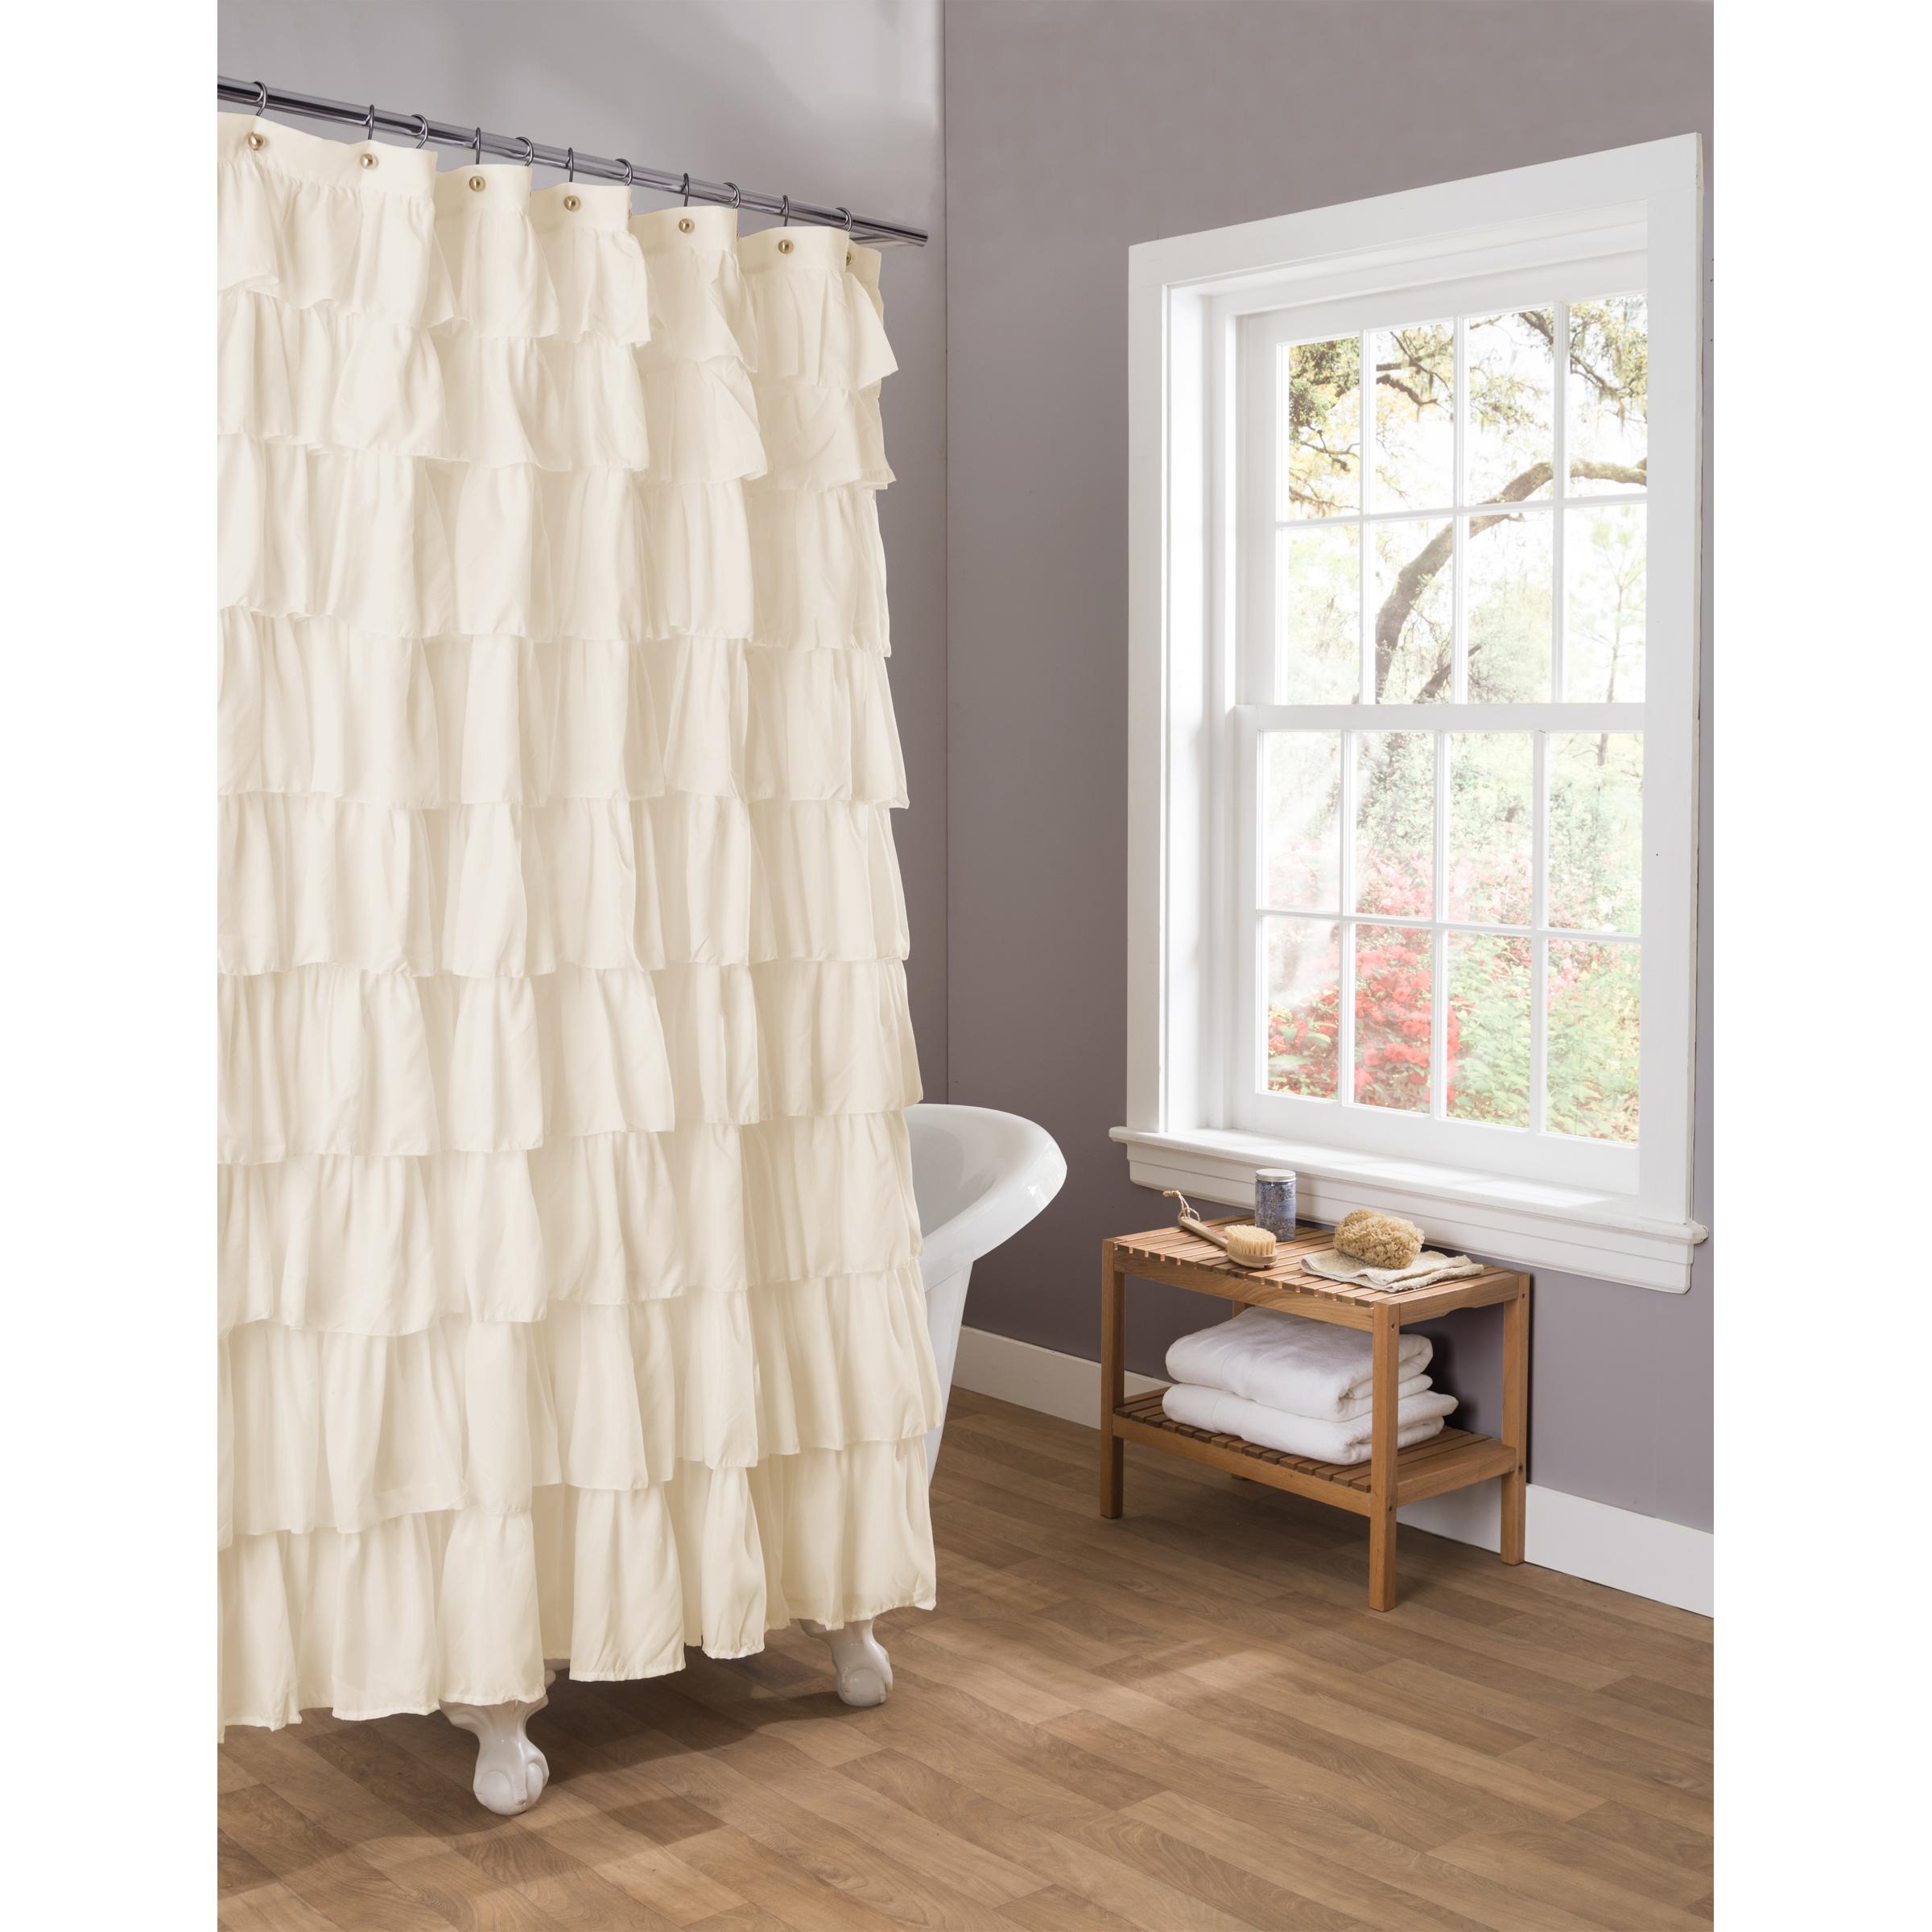 Lush Decor Ruffle Ivory Shower Curtain